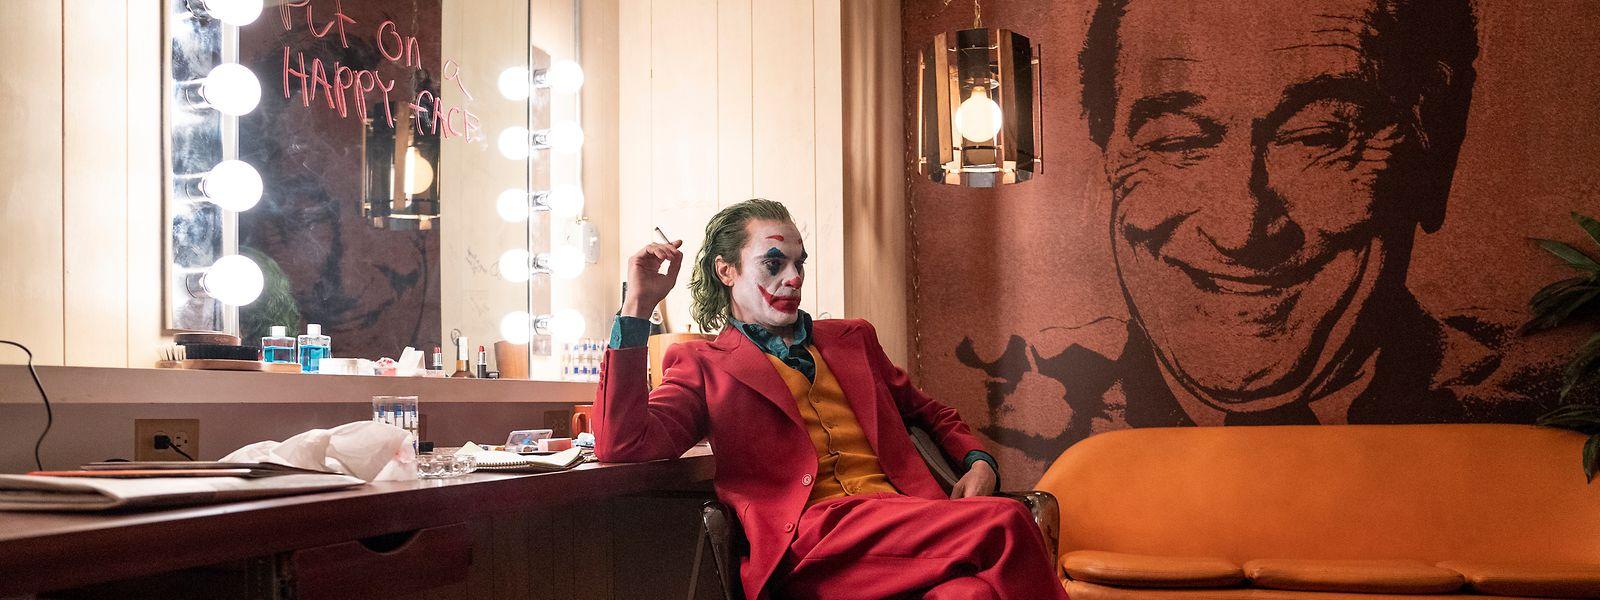 "Joaquin Phoenix als Arthur Fleck (Joker) in einer Szene des Films ""Joker""."